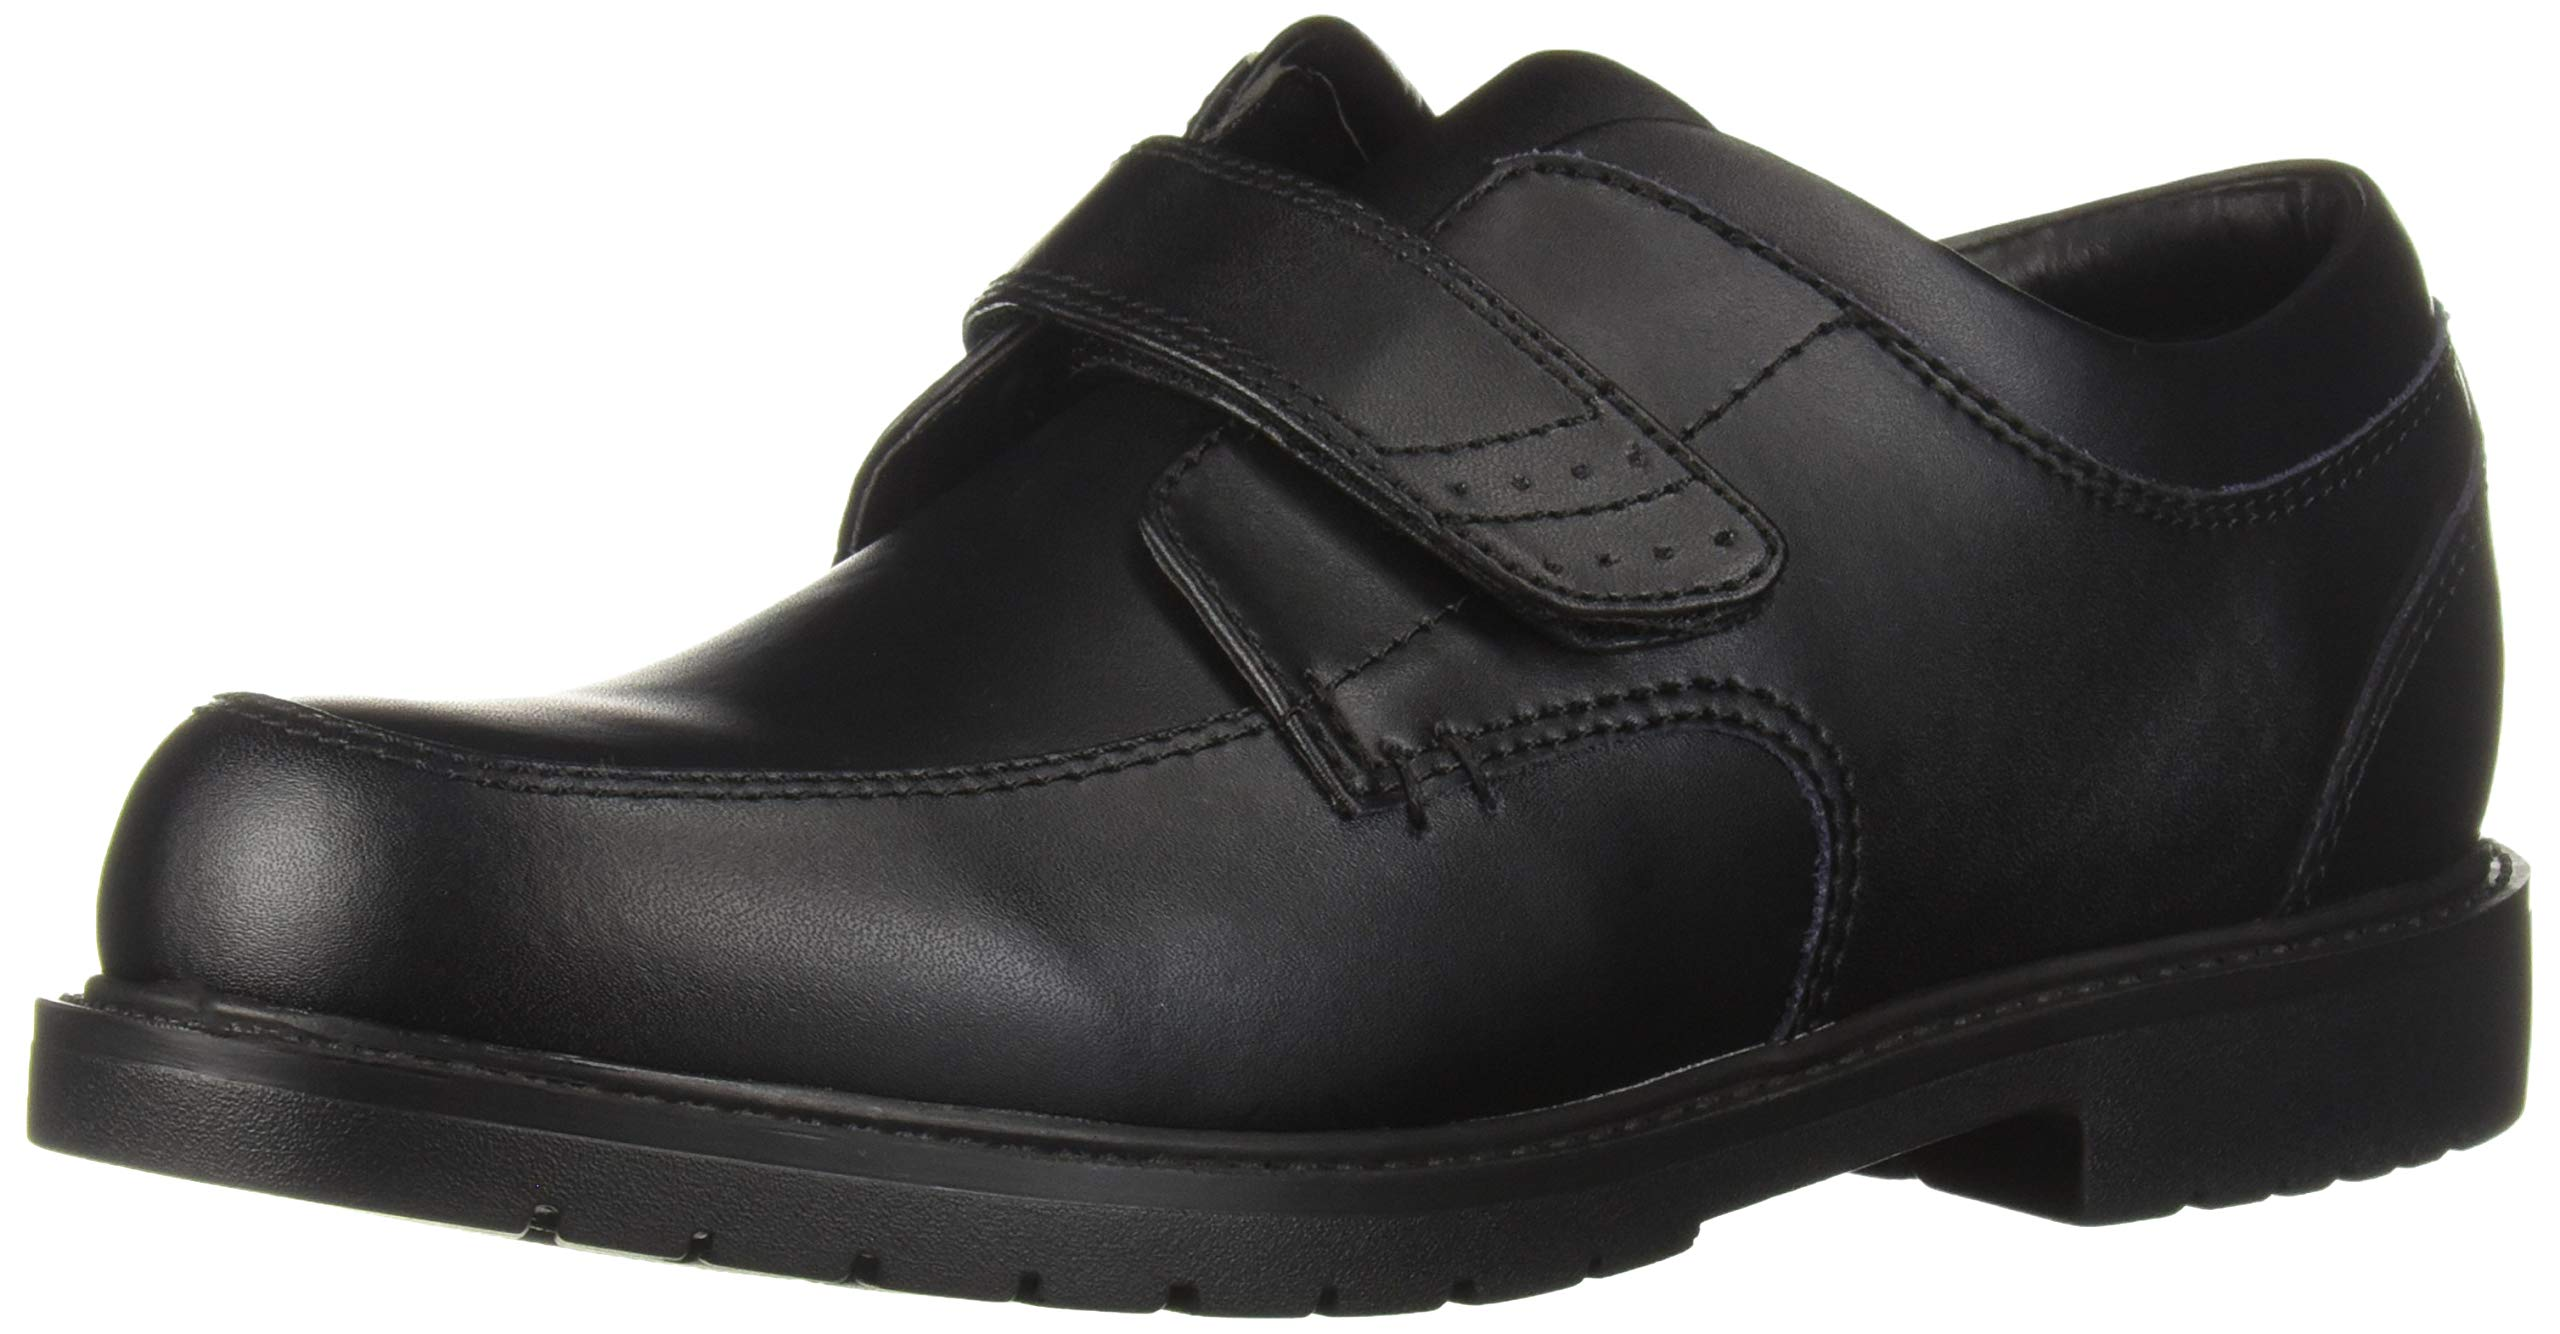 Academie Gear Boys' Inside School Uniform Shoe, Black, 13.5 Medium US Little Kid